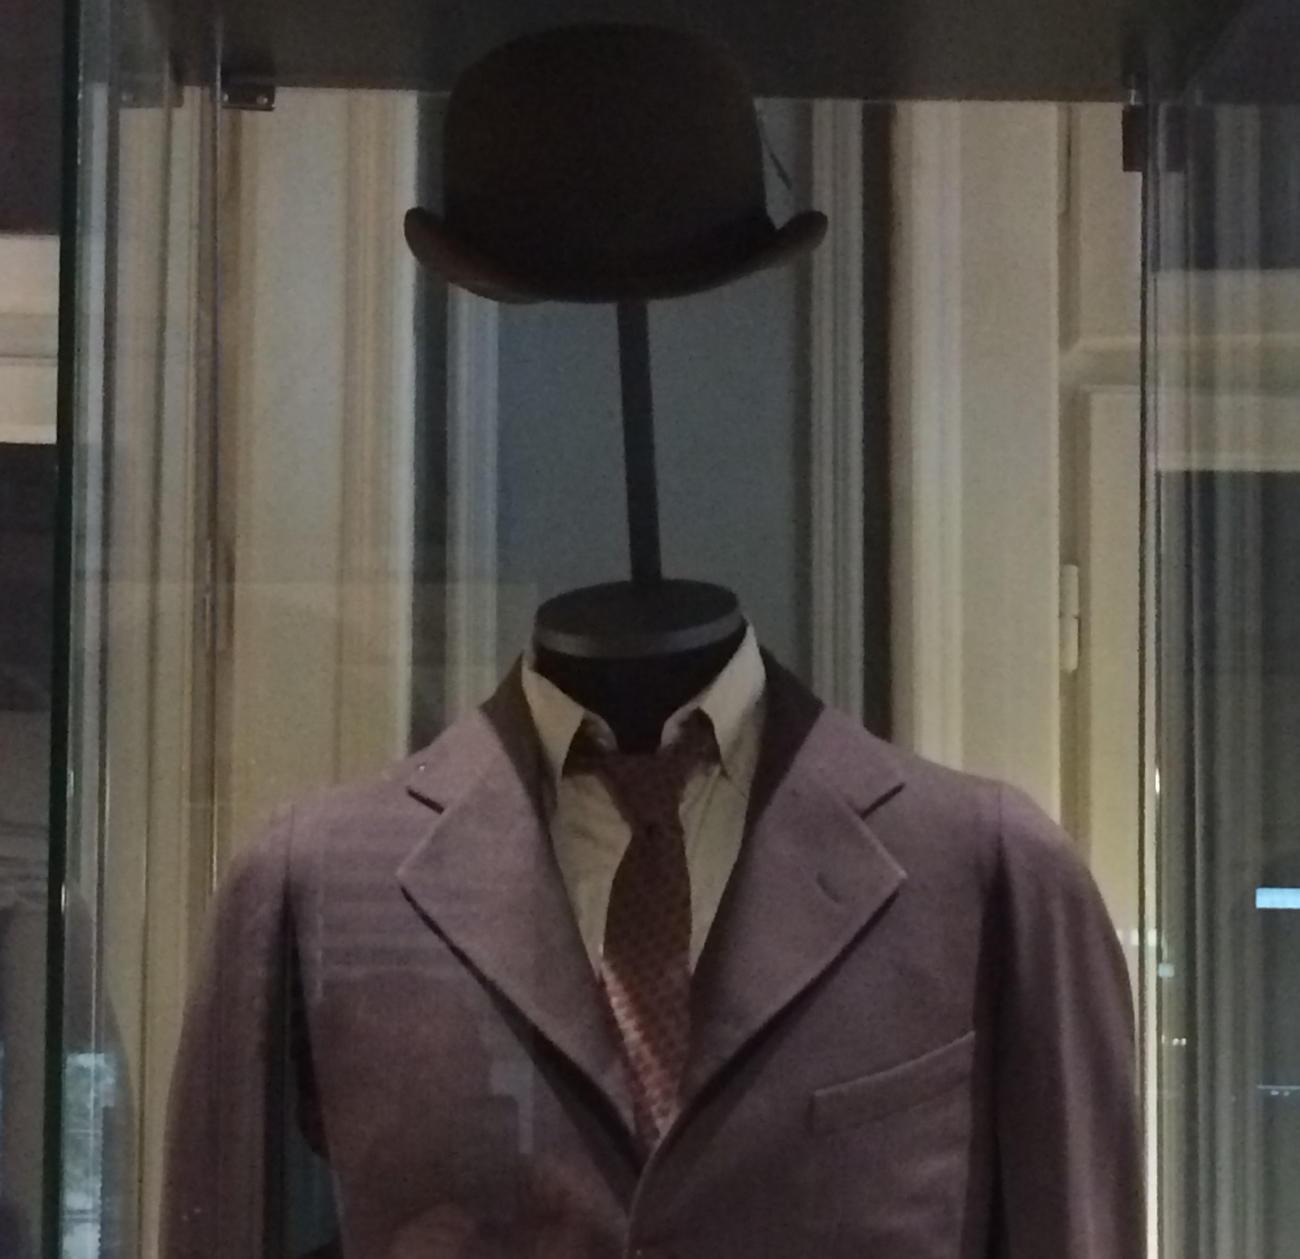 Nikola Tesla's clothes